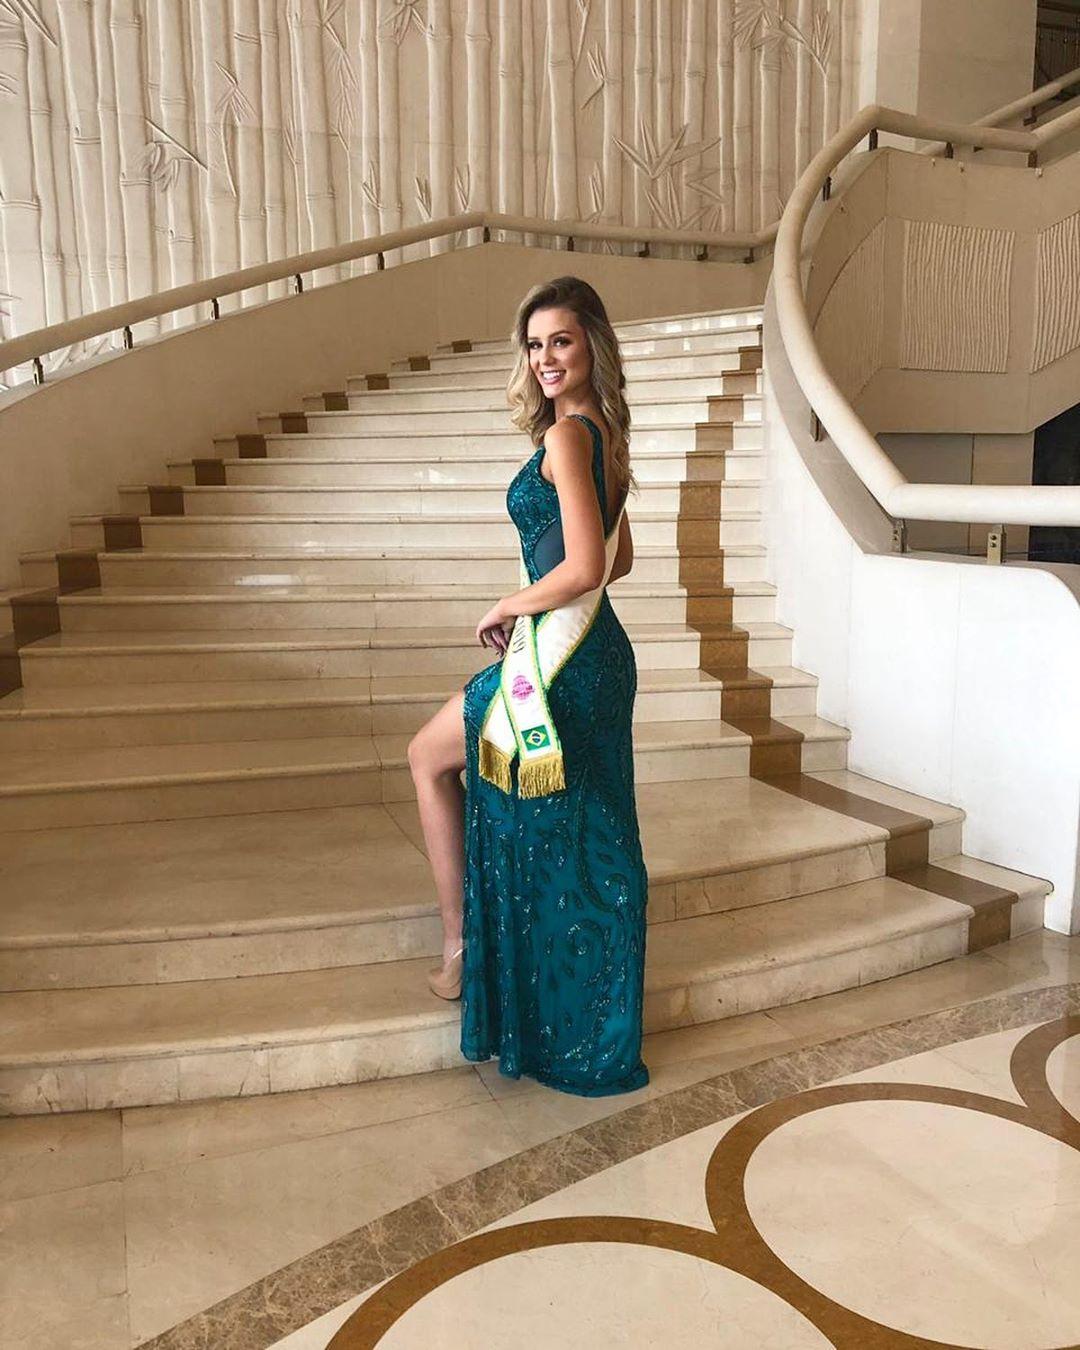 marcella kozinski de barros, 3rd runner-up de miss tourism world 2019. - Página 4 69273710